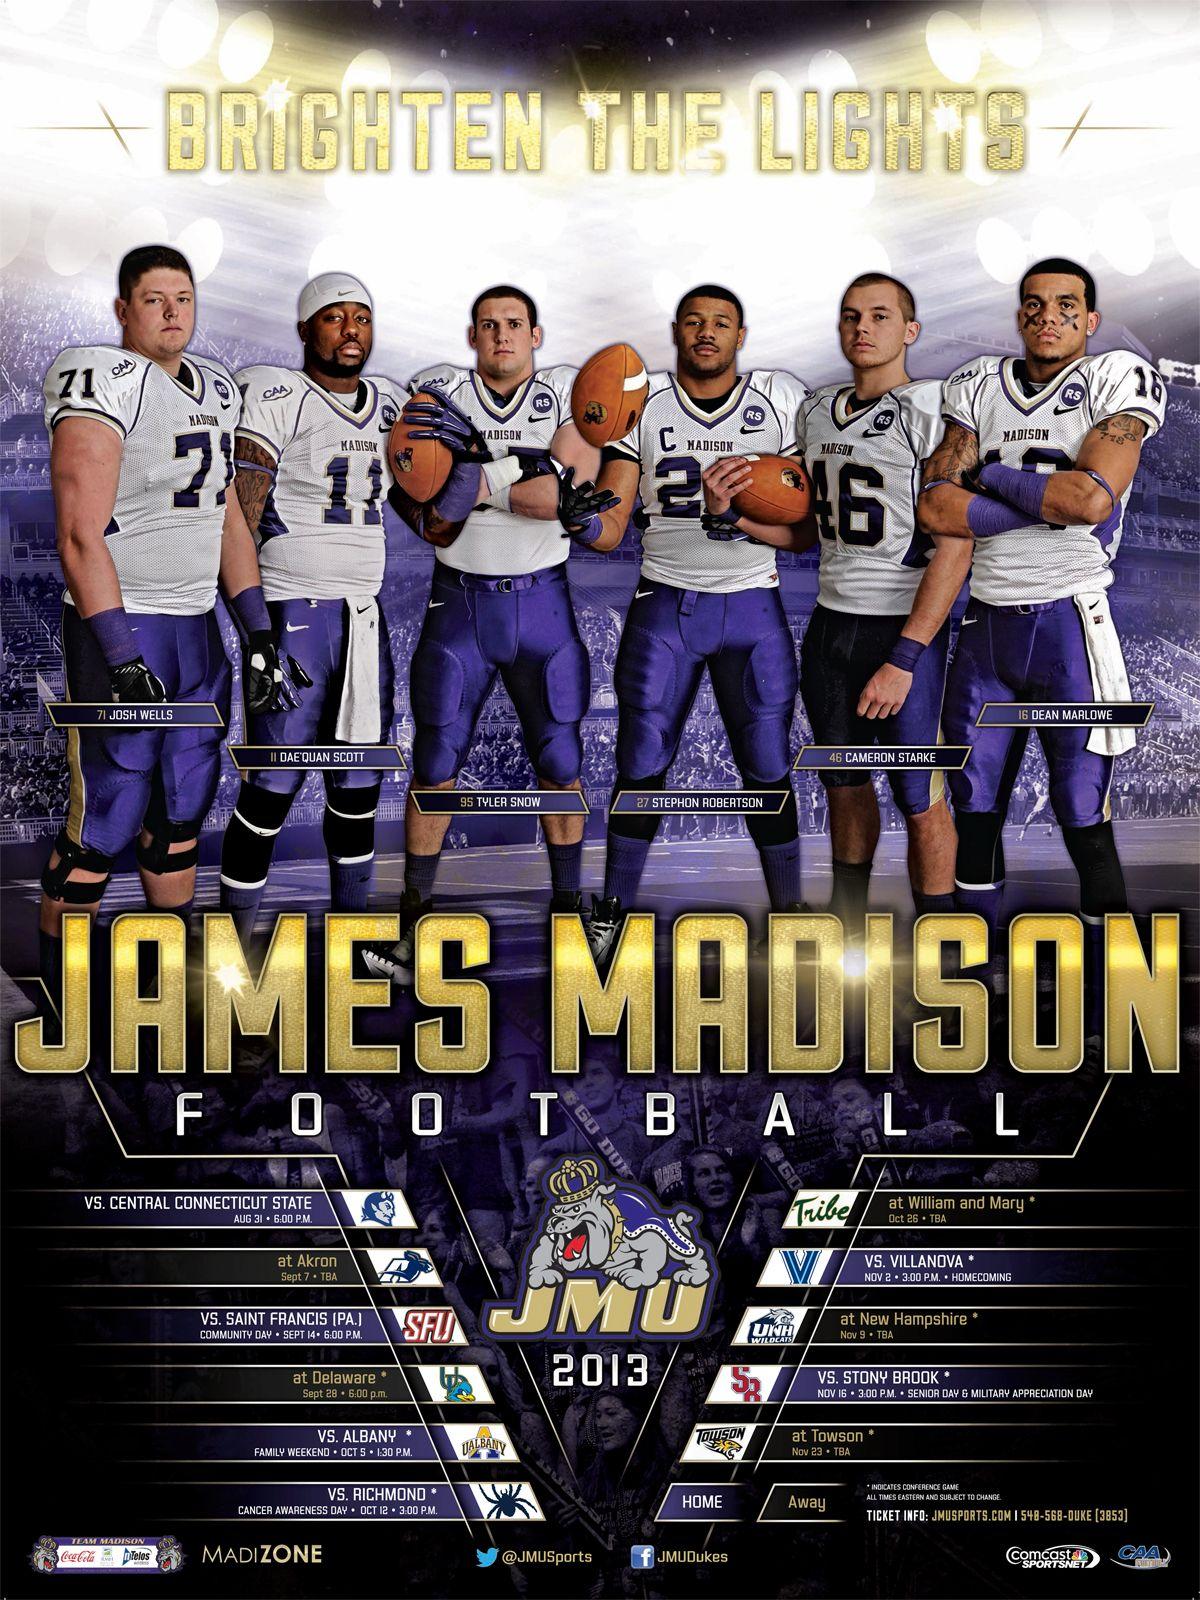 james madison football roster